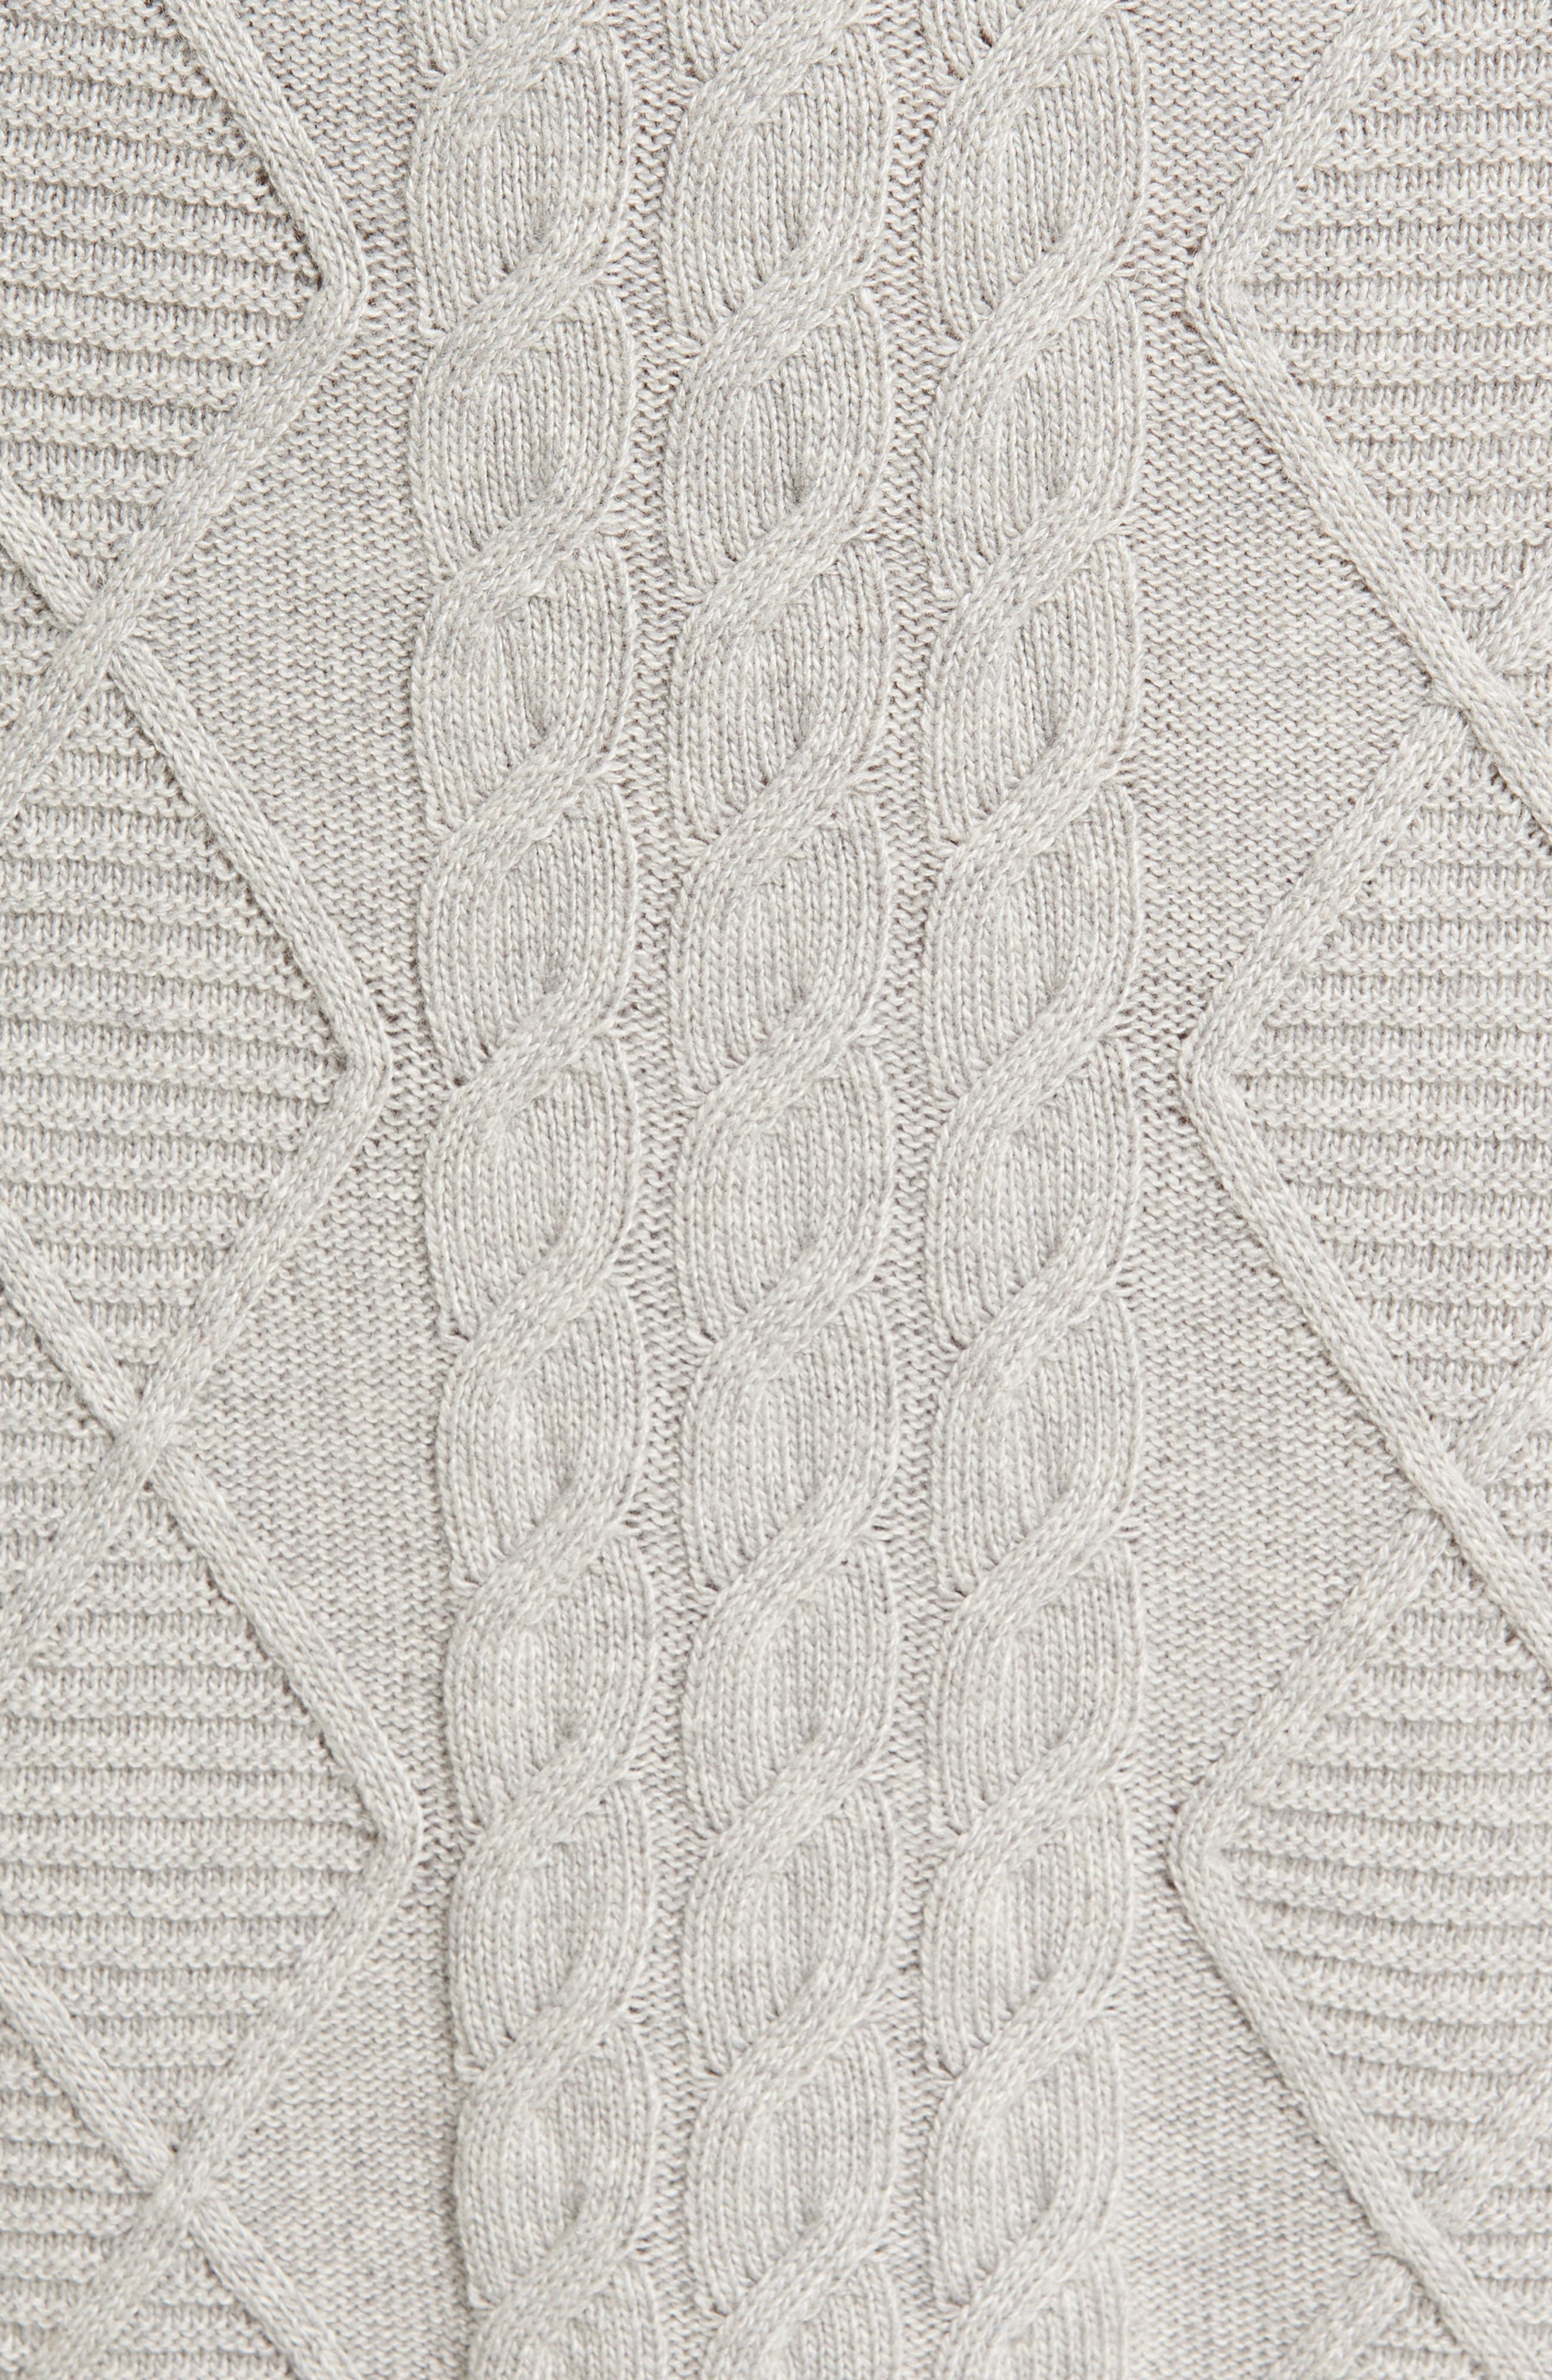 Emmanuel Cable Knit Sweater Dress,                             Alternate thumbnail 5, color,                             050